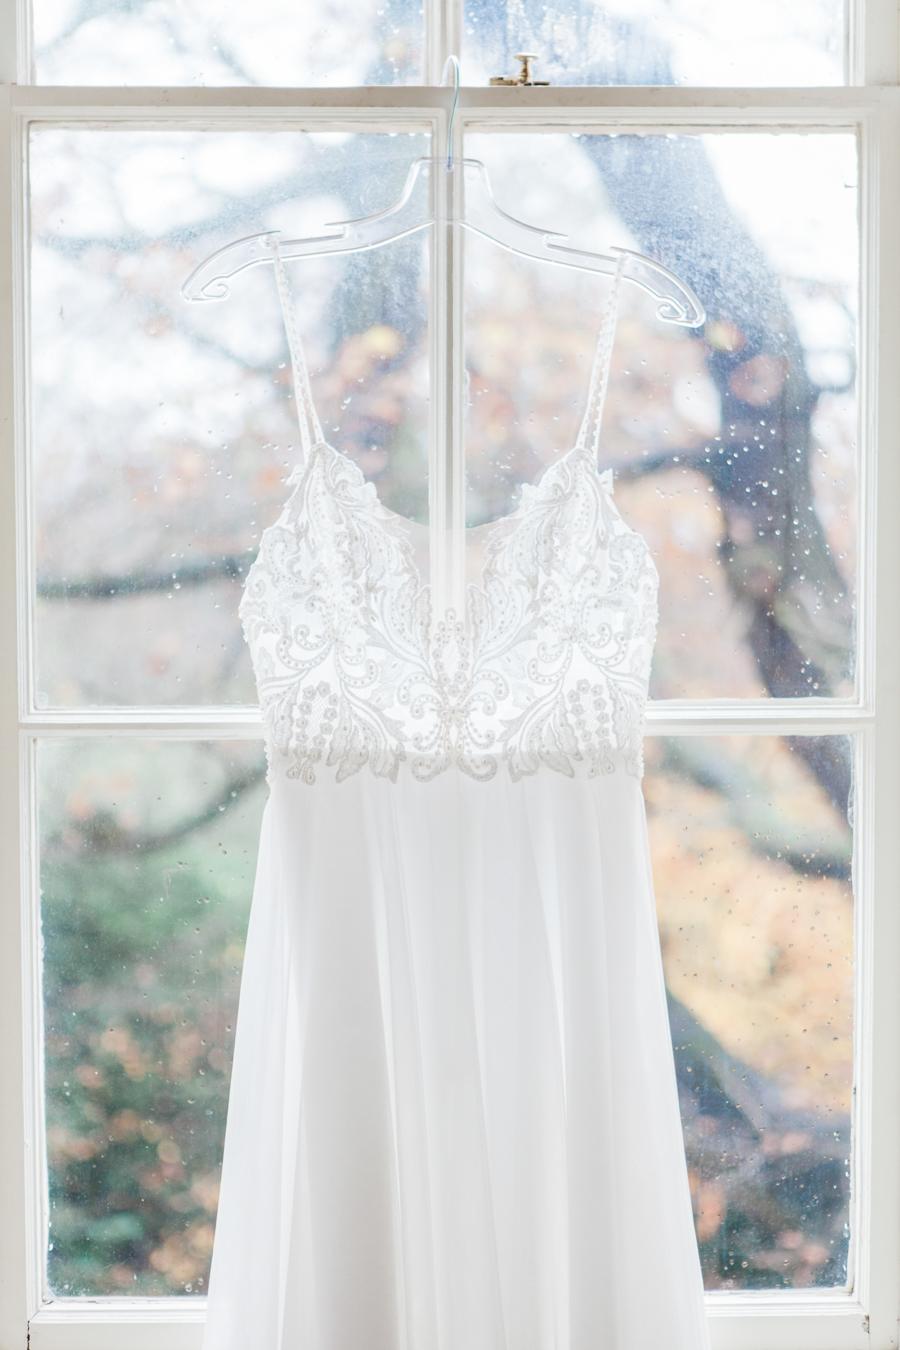 Starry celestial wedding inspiration (with a sprinkling of Disney magic) - Amanda Karen Photography (3)